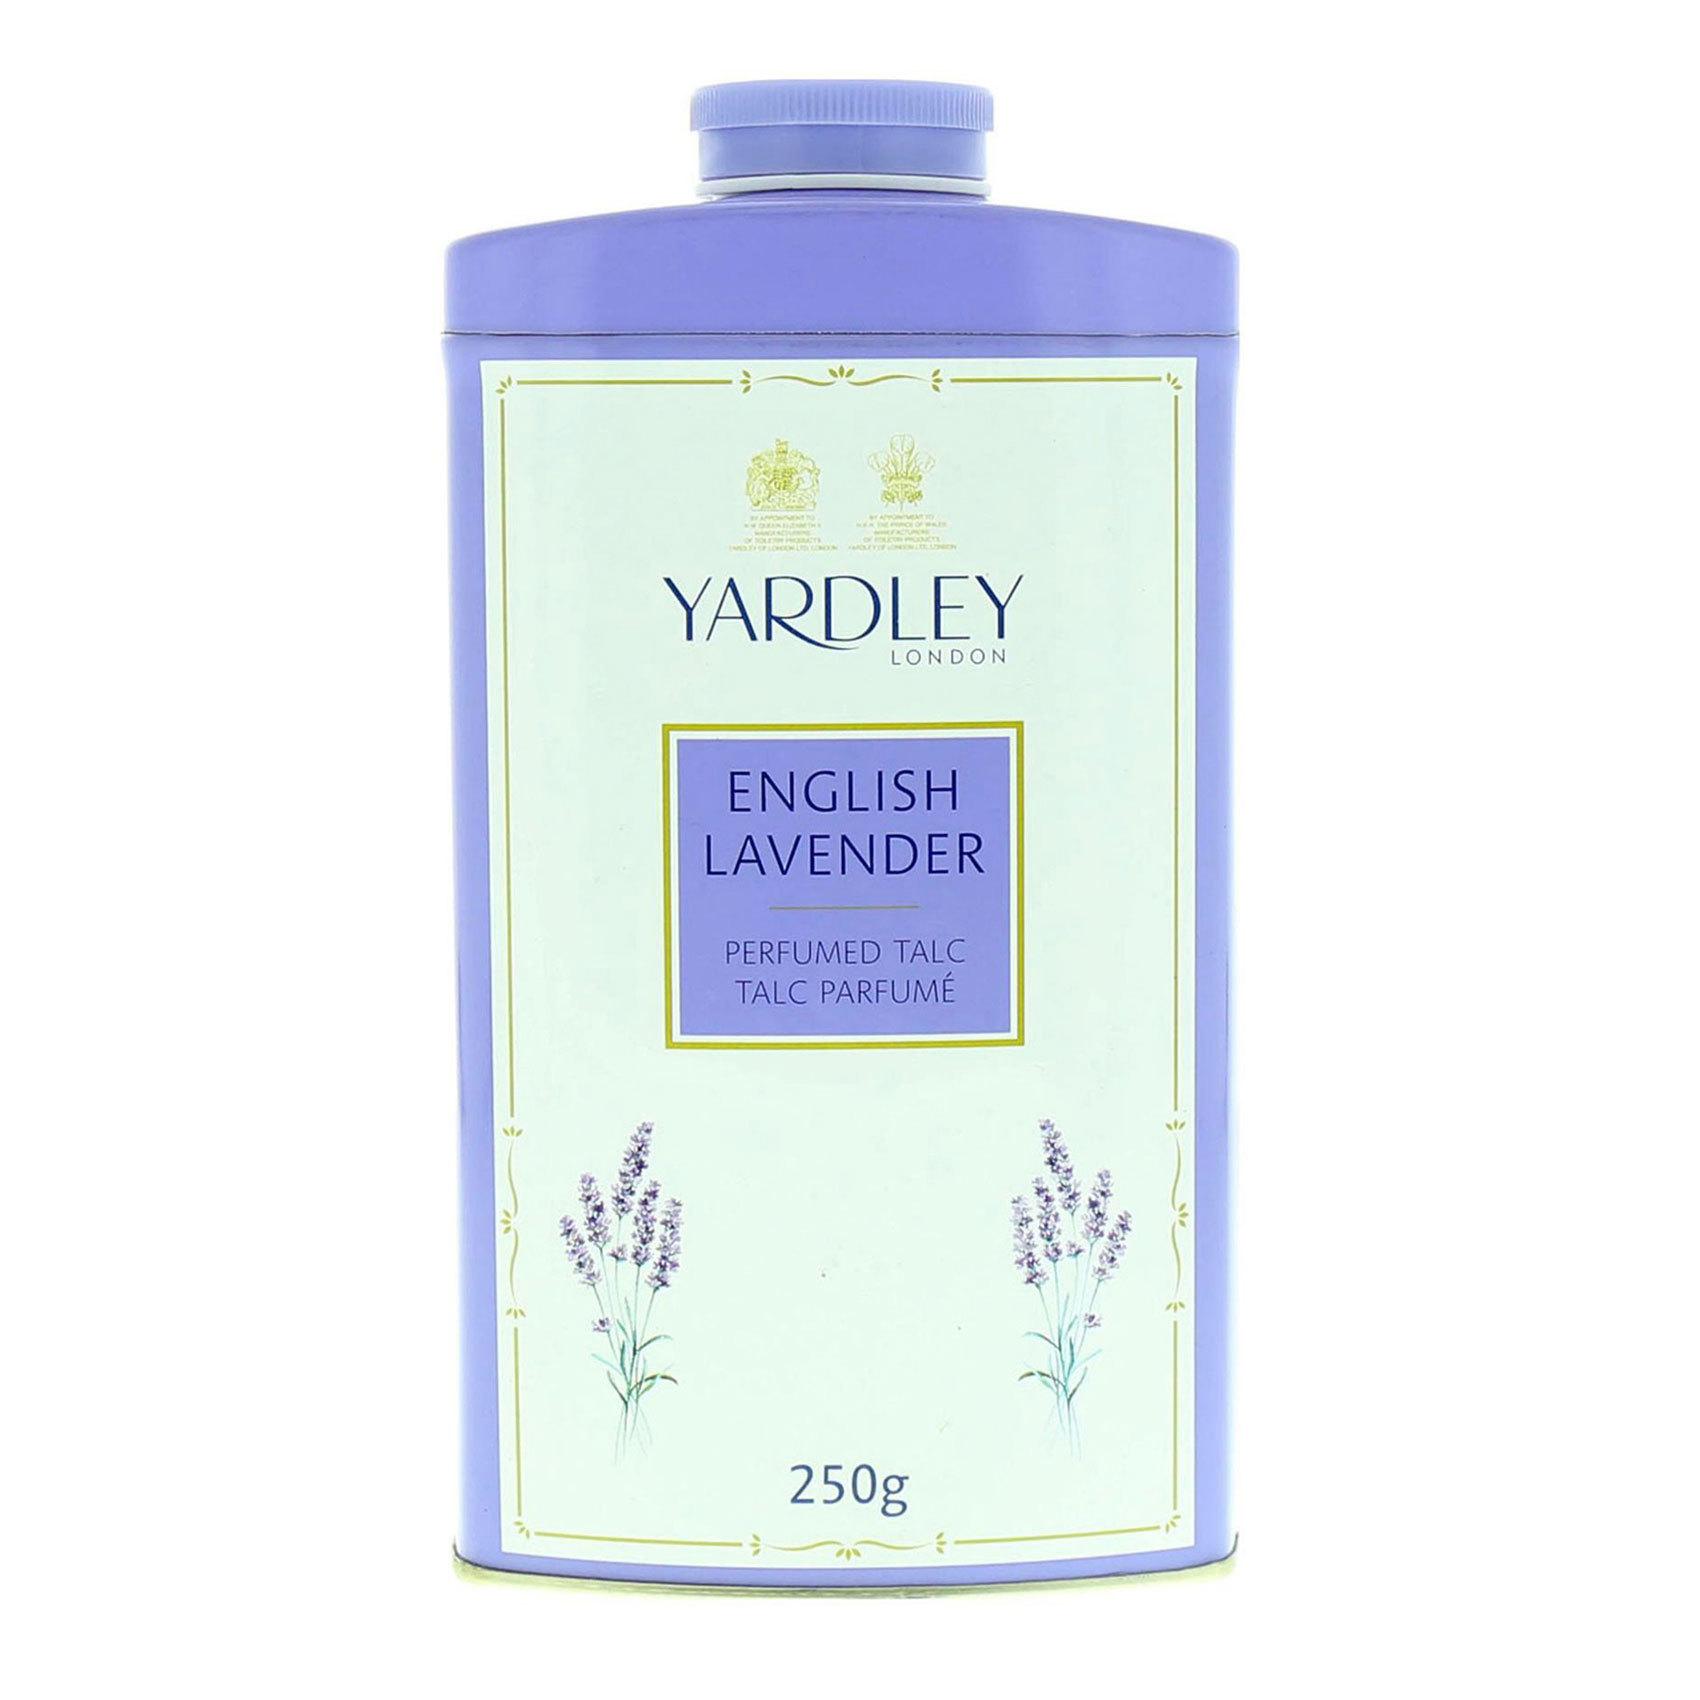 YARDLEY ENGLISH LAVENDER TALC 250G